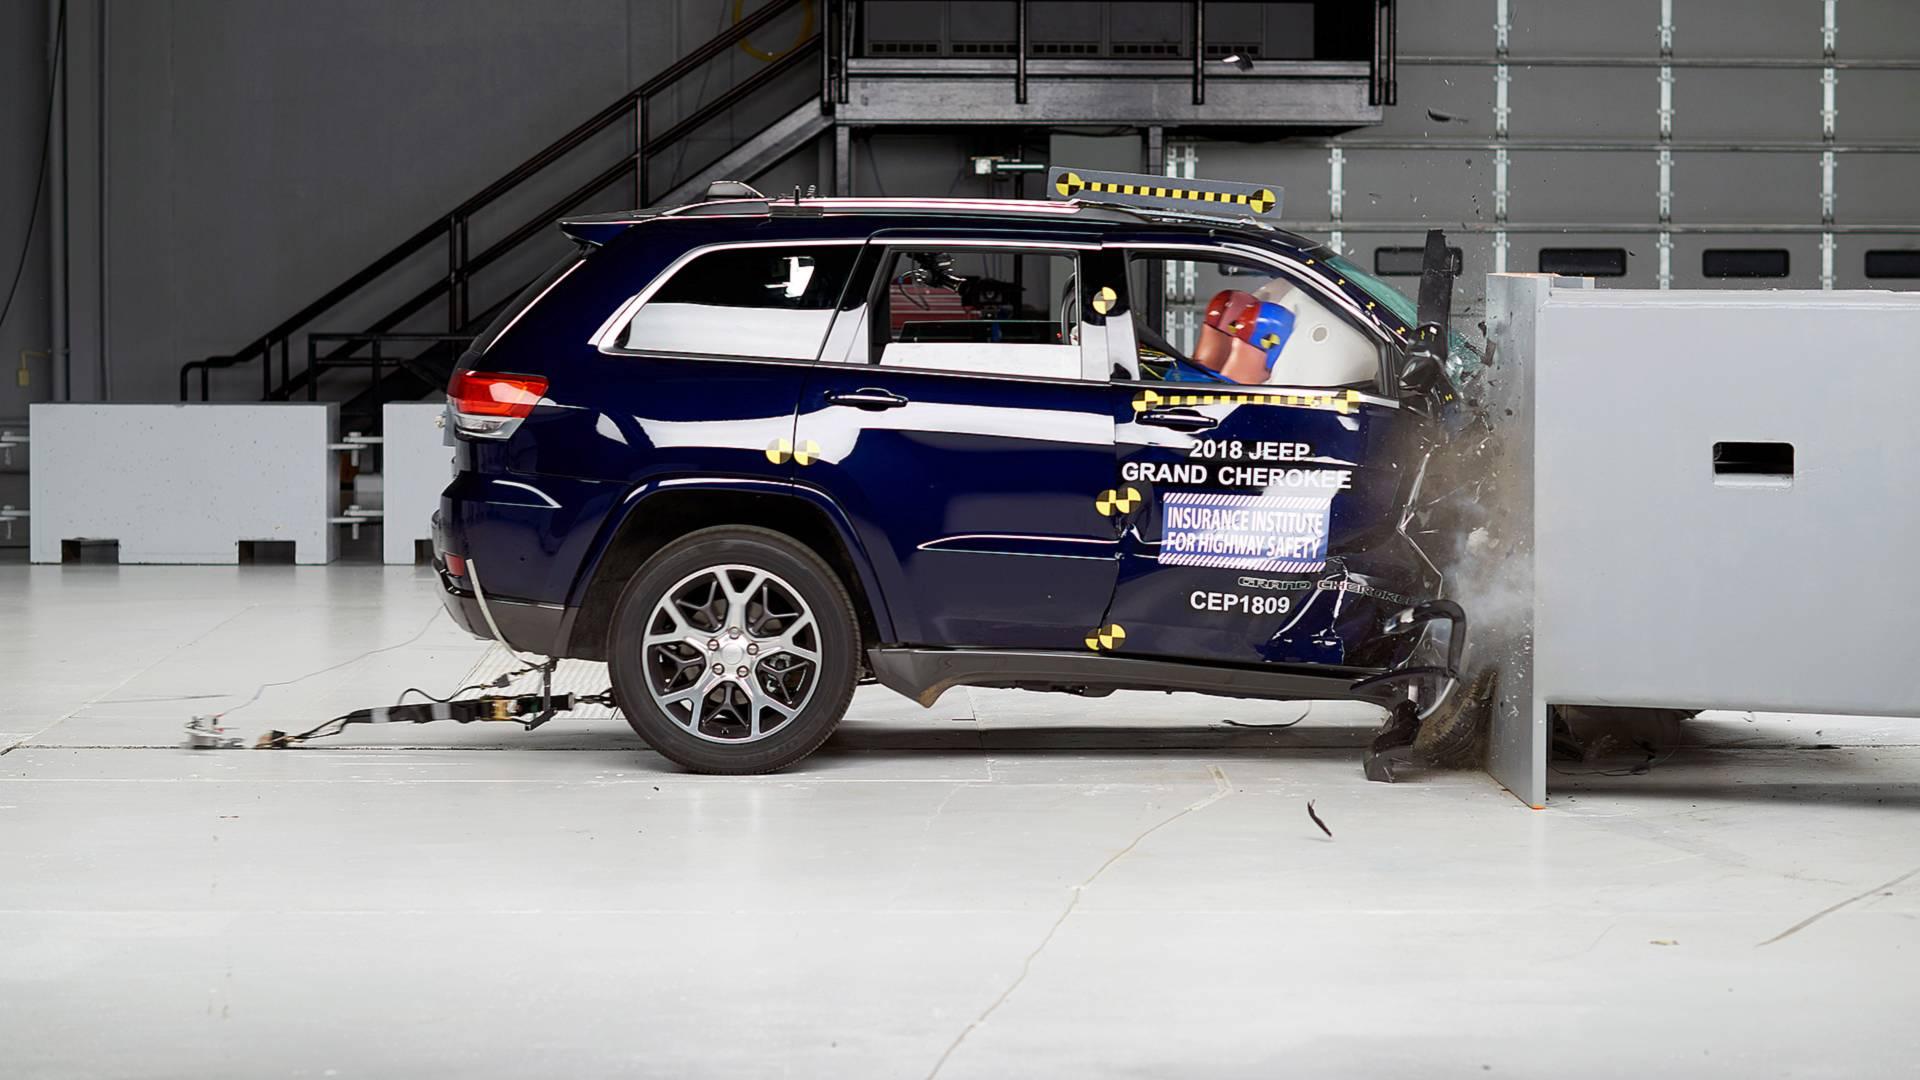 Ford Explorer и Jeep Grand Cherokee провалили краш-тесты с малым перекрытием